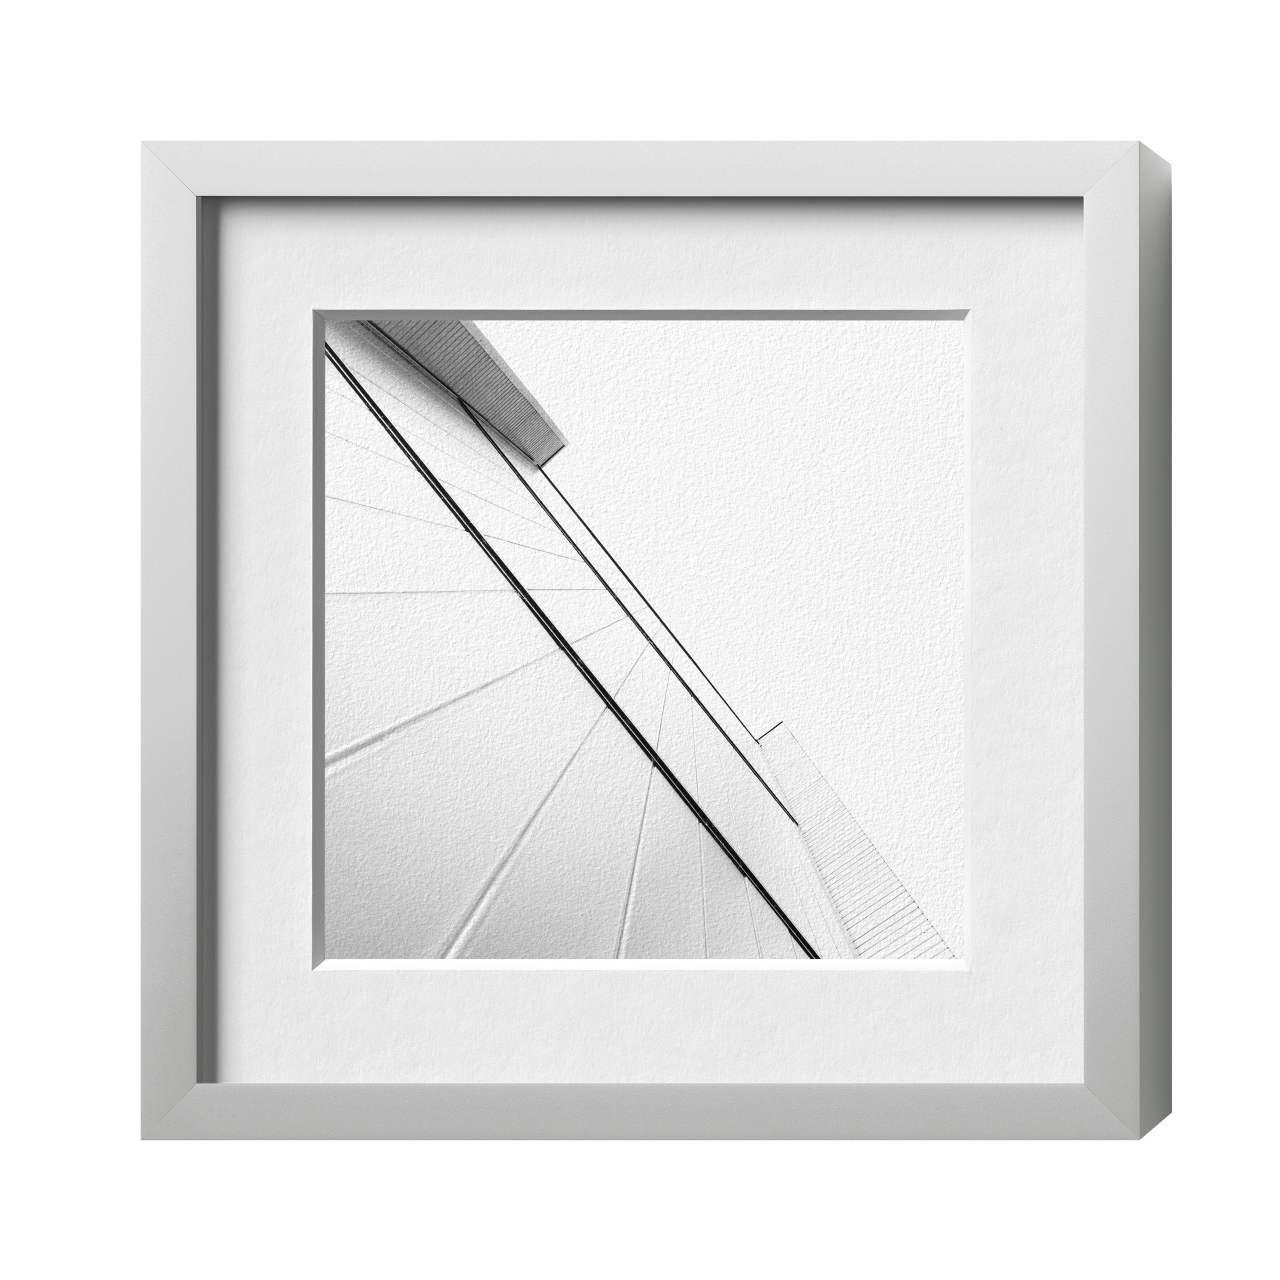 Protect Alu 18, Silber matt, Plexiglas glä. kf, 210 x 297 | HALBE-Rahmen